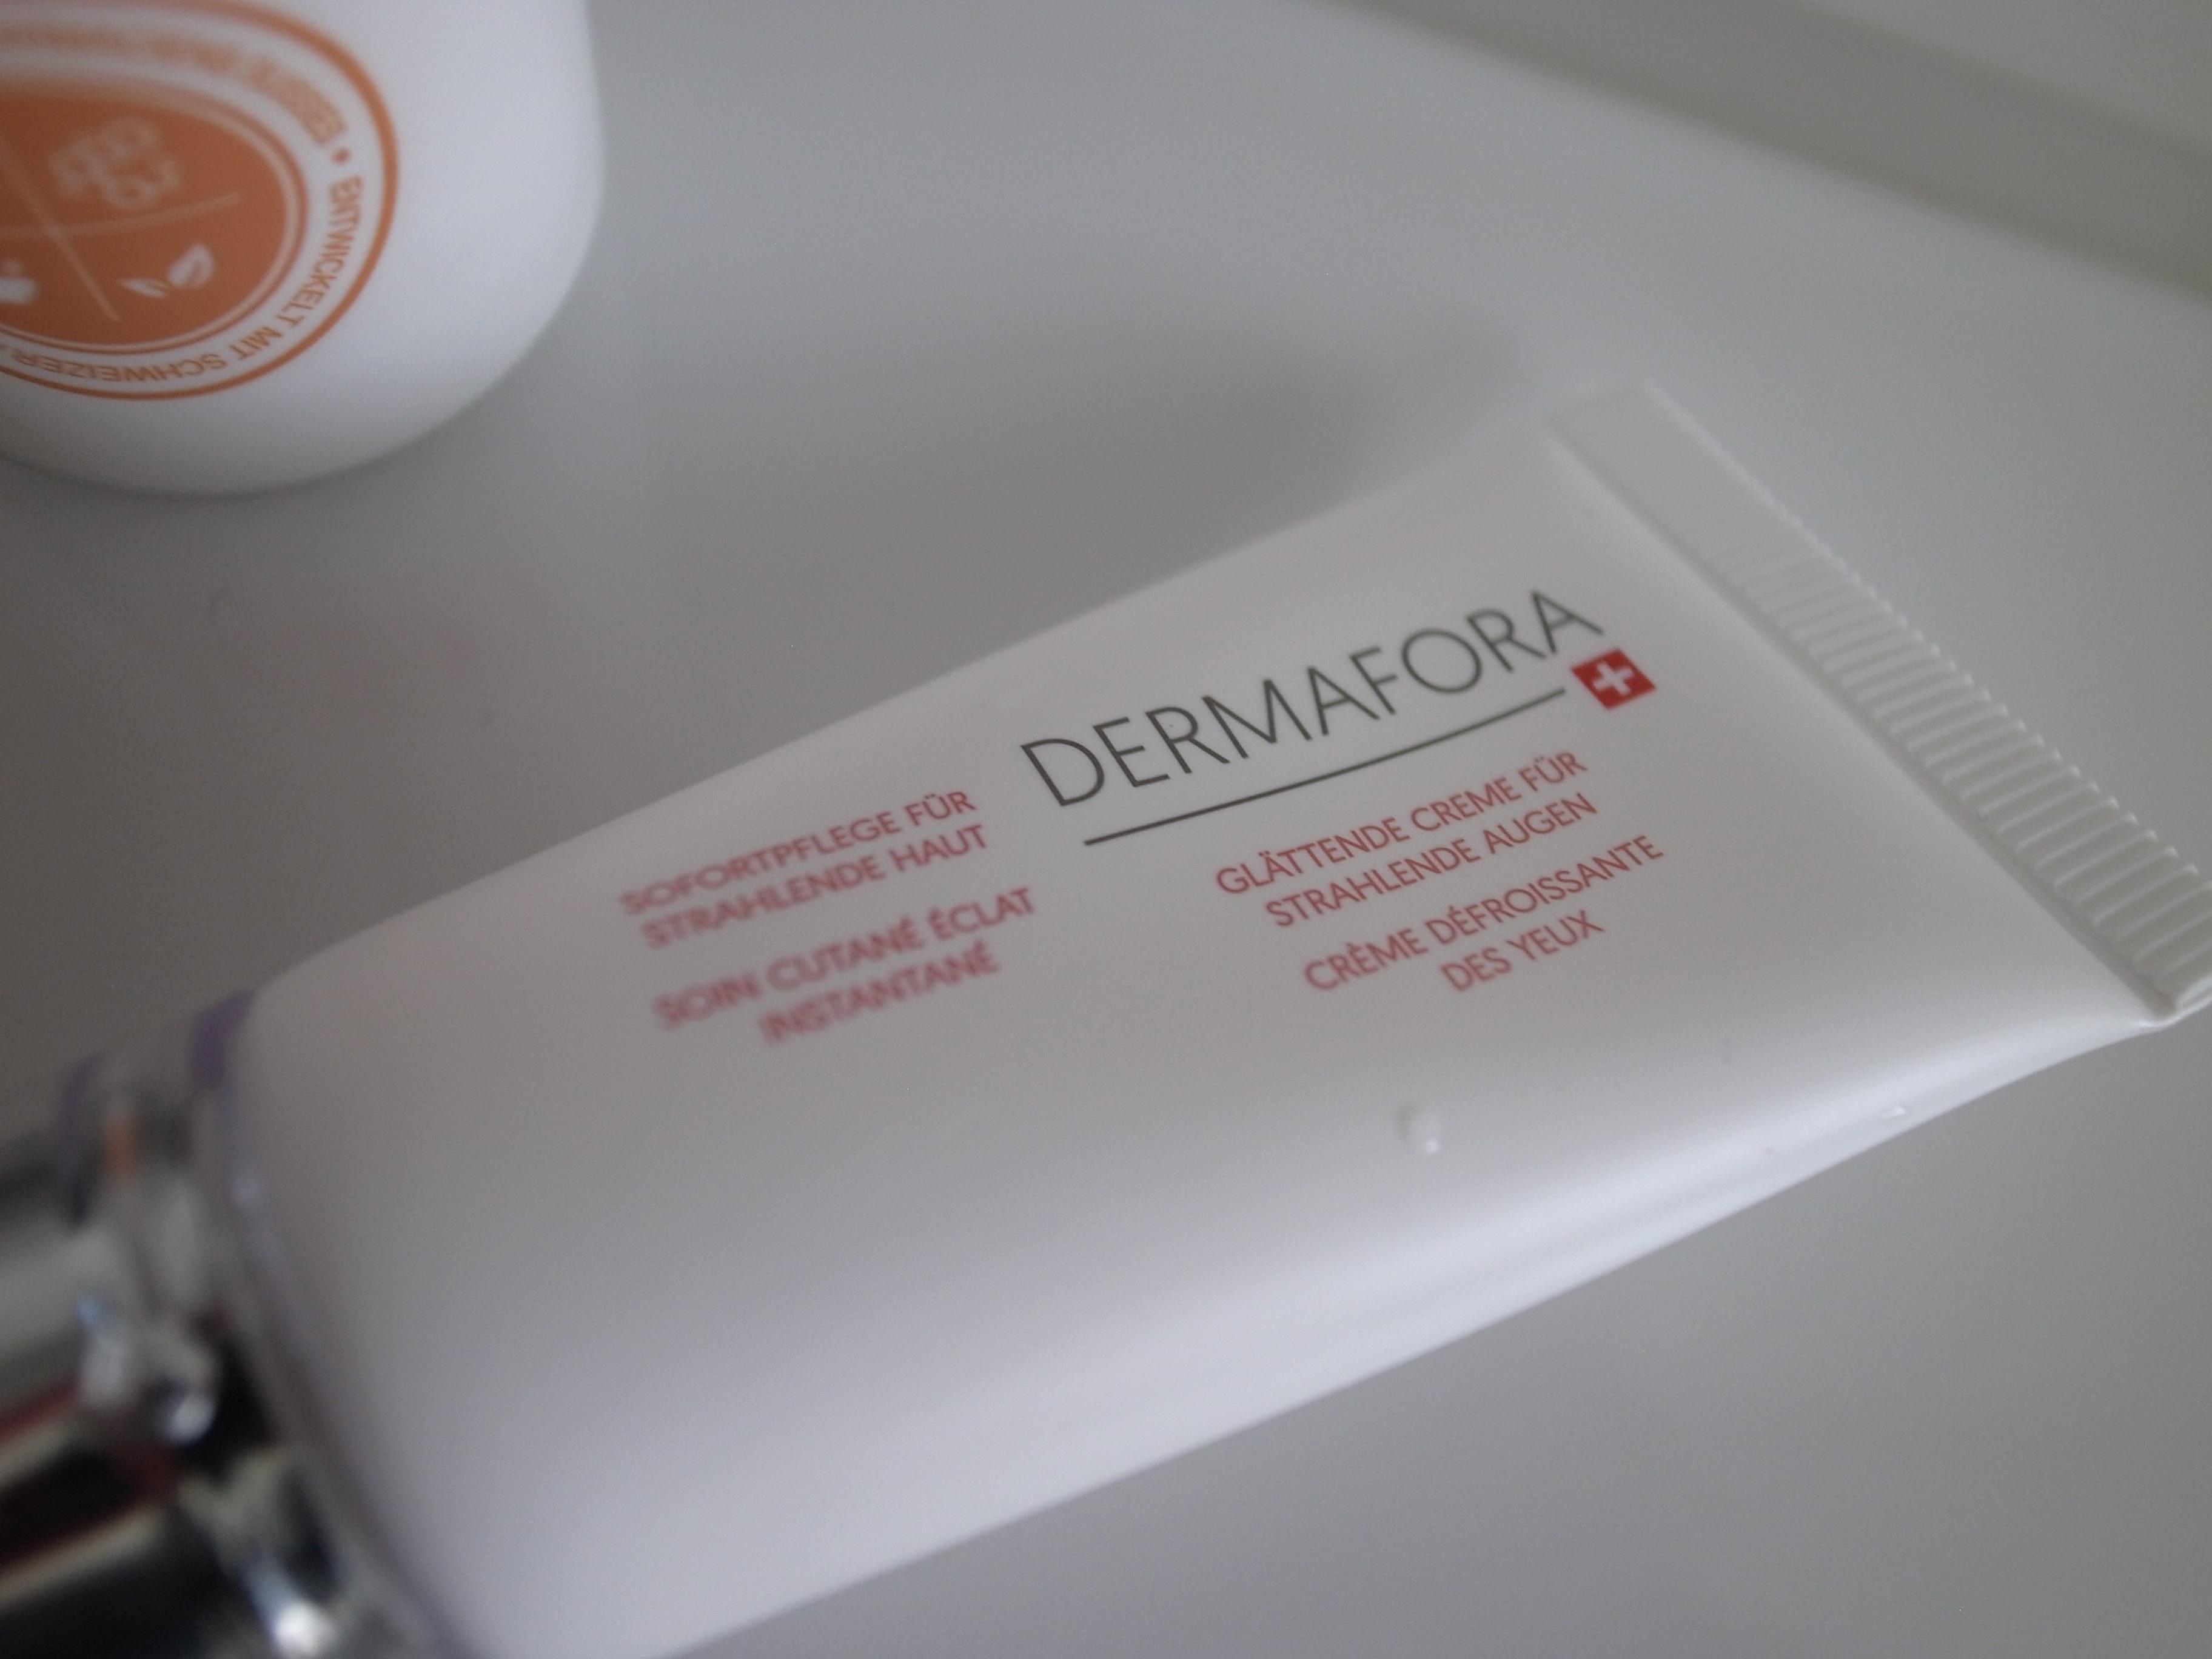 DERMAFORA Dermokosmetik